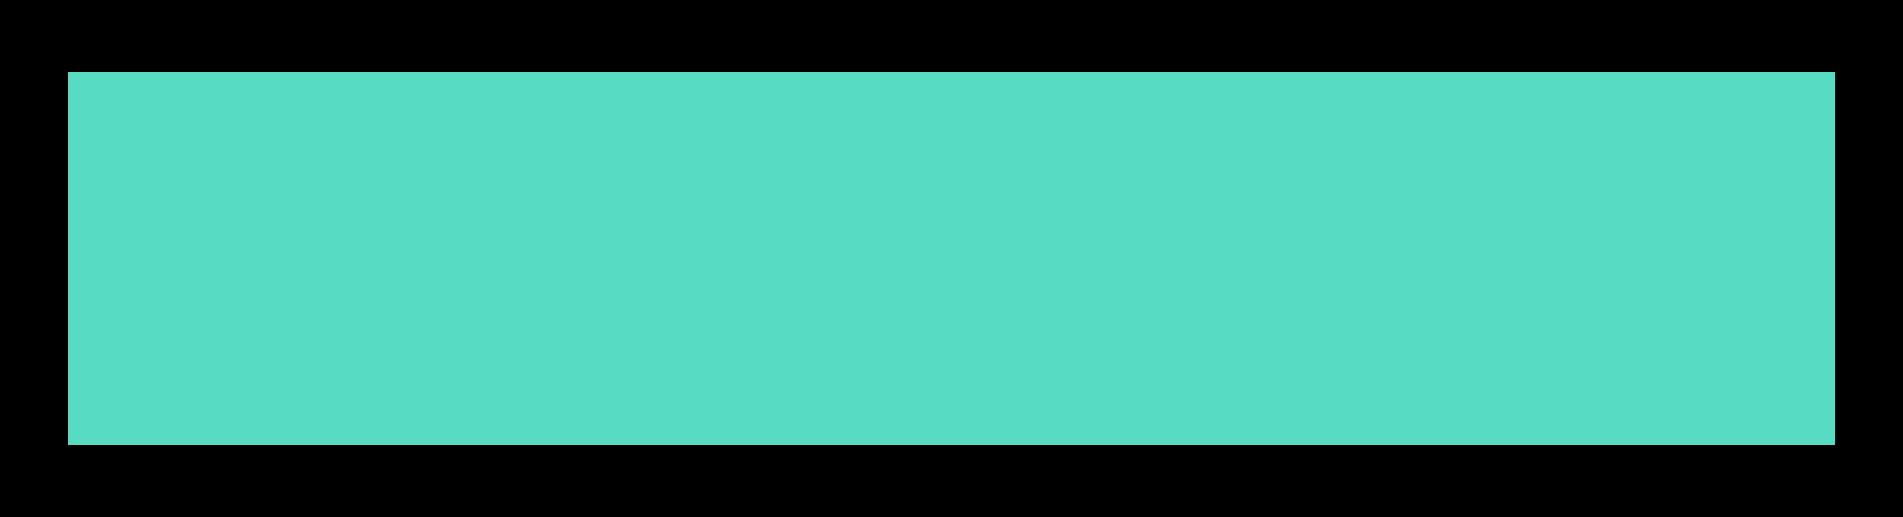 Homie Company Logo